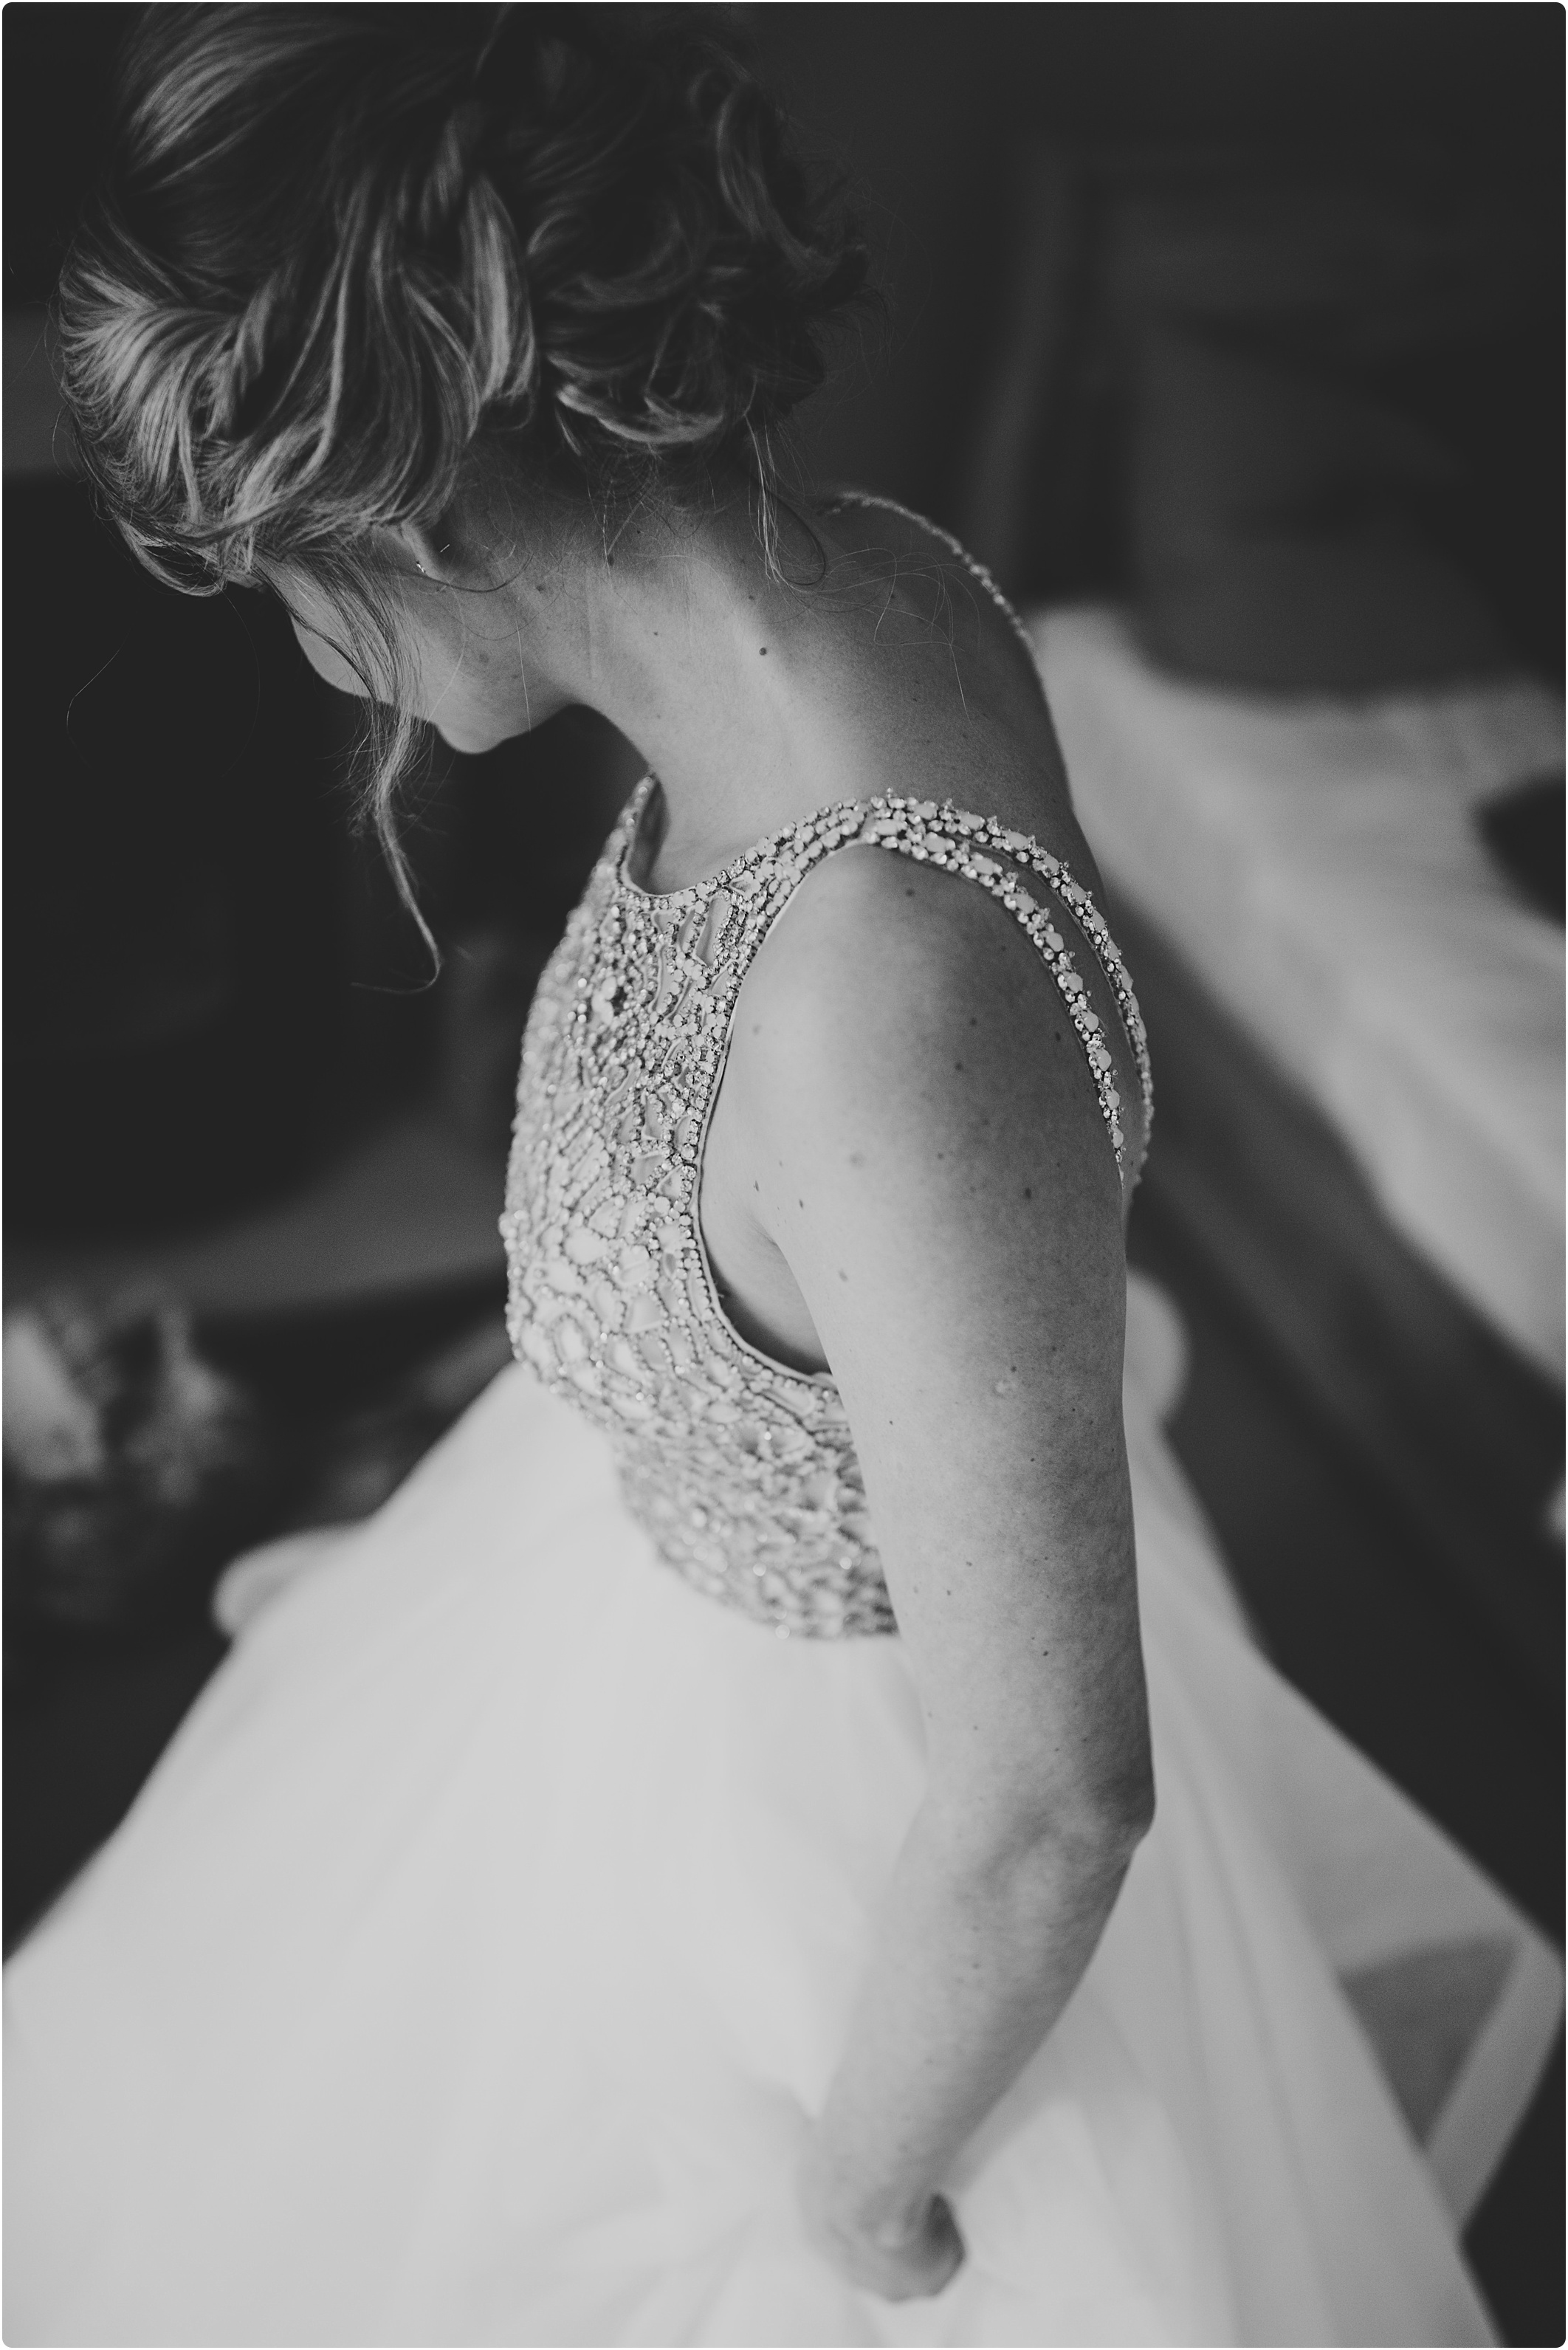 hayley paige dress